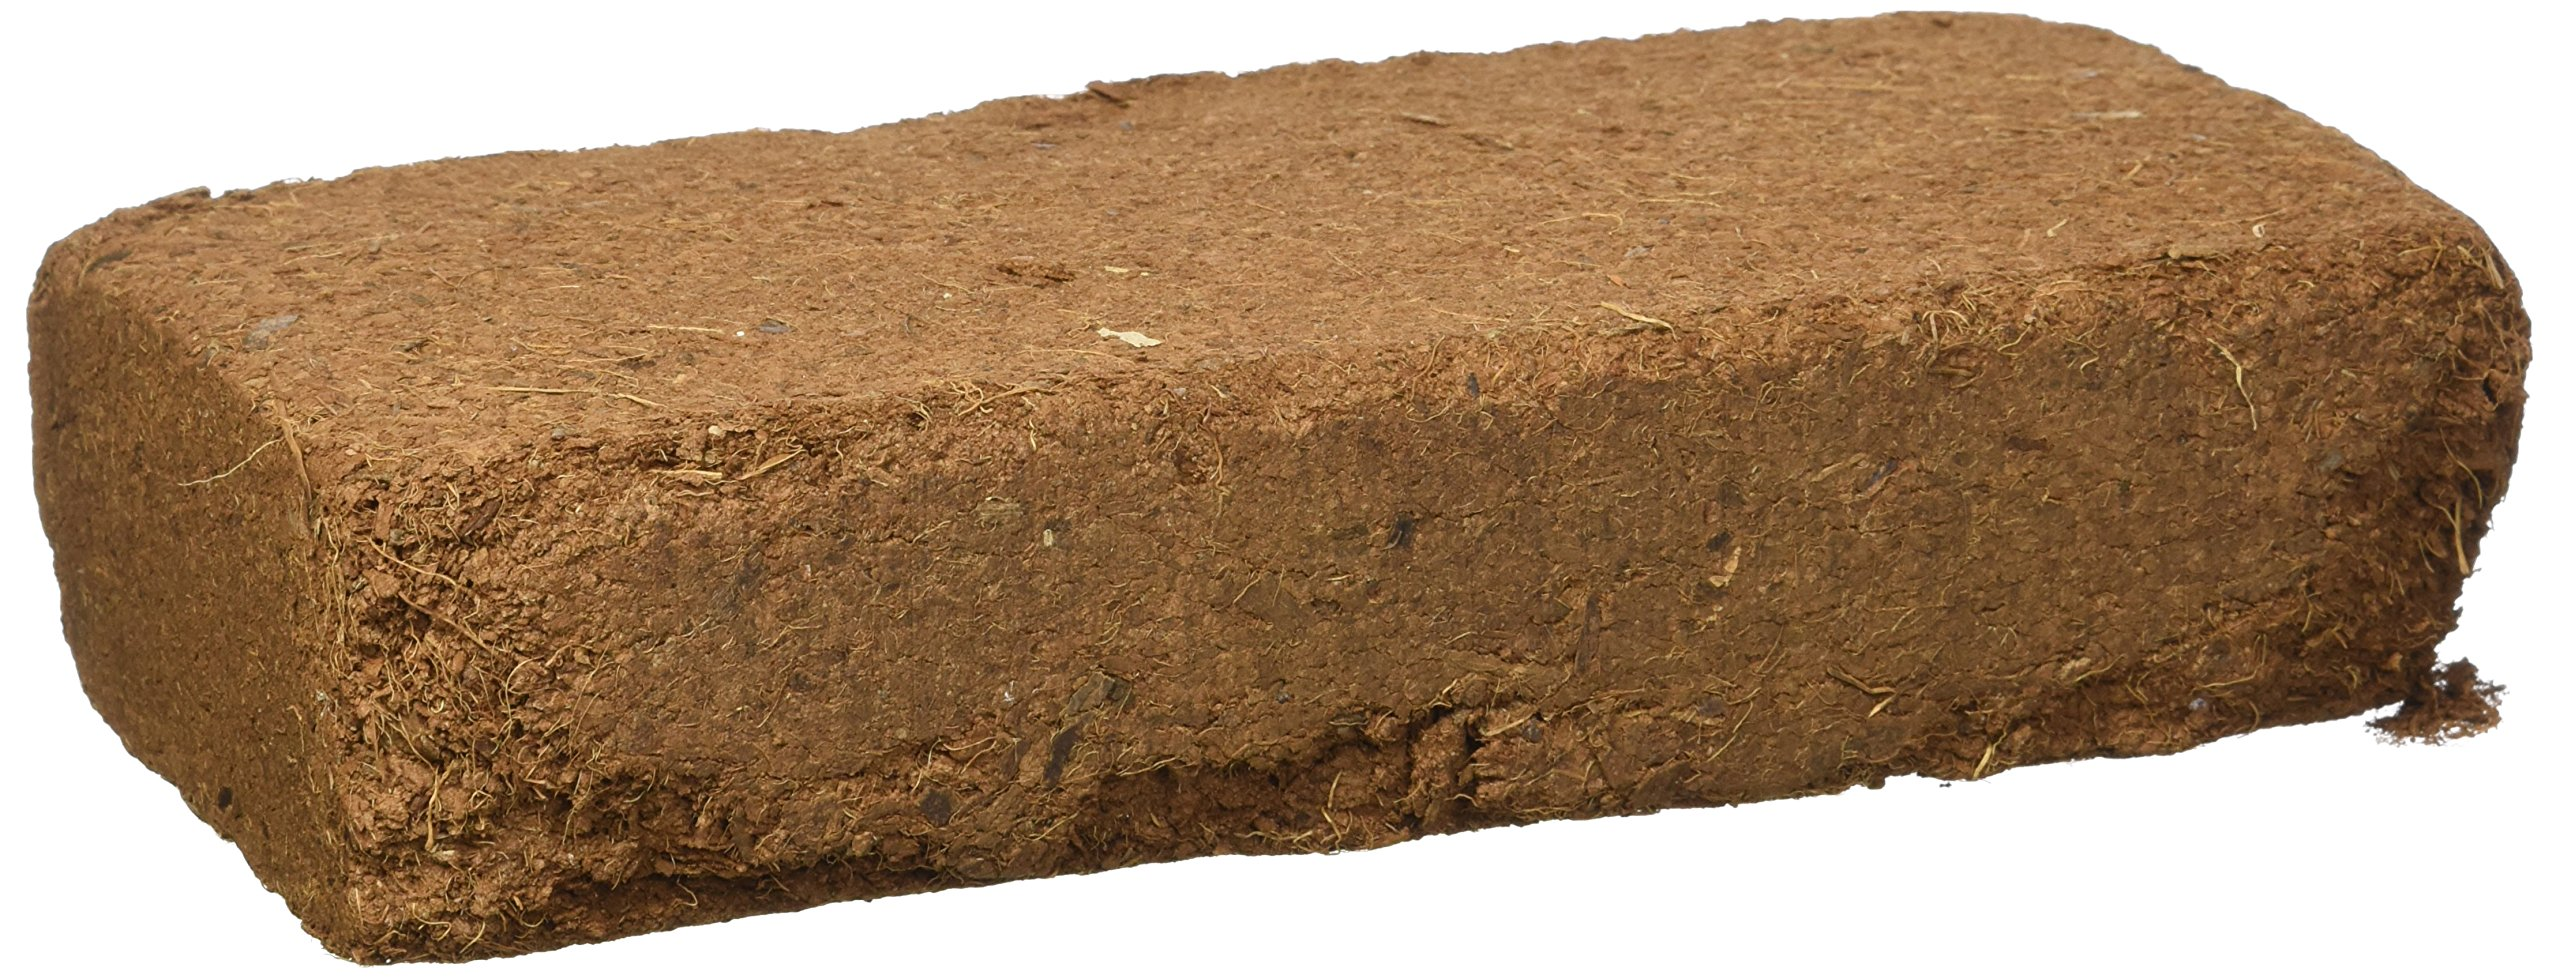 Galapagos (05001) Invertebrate Tropicoco Soil, Natural, 8qt Compressed Brick